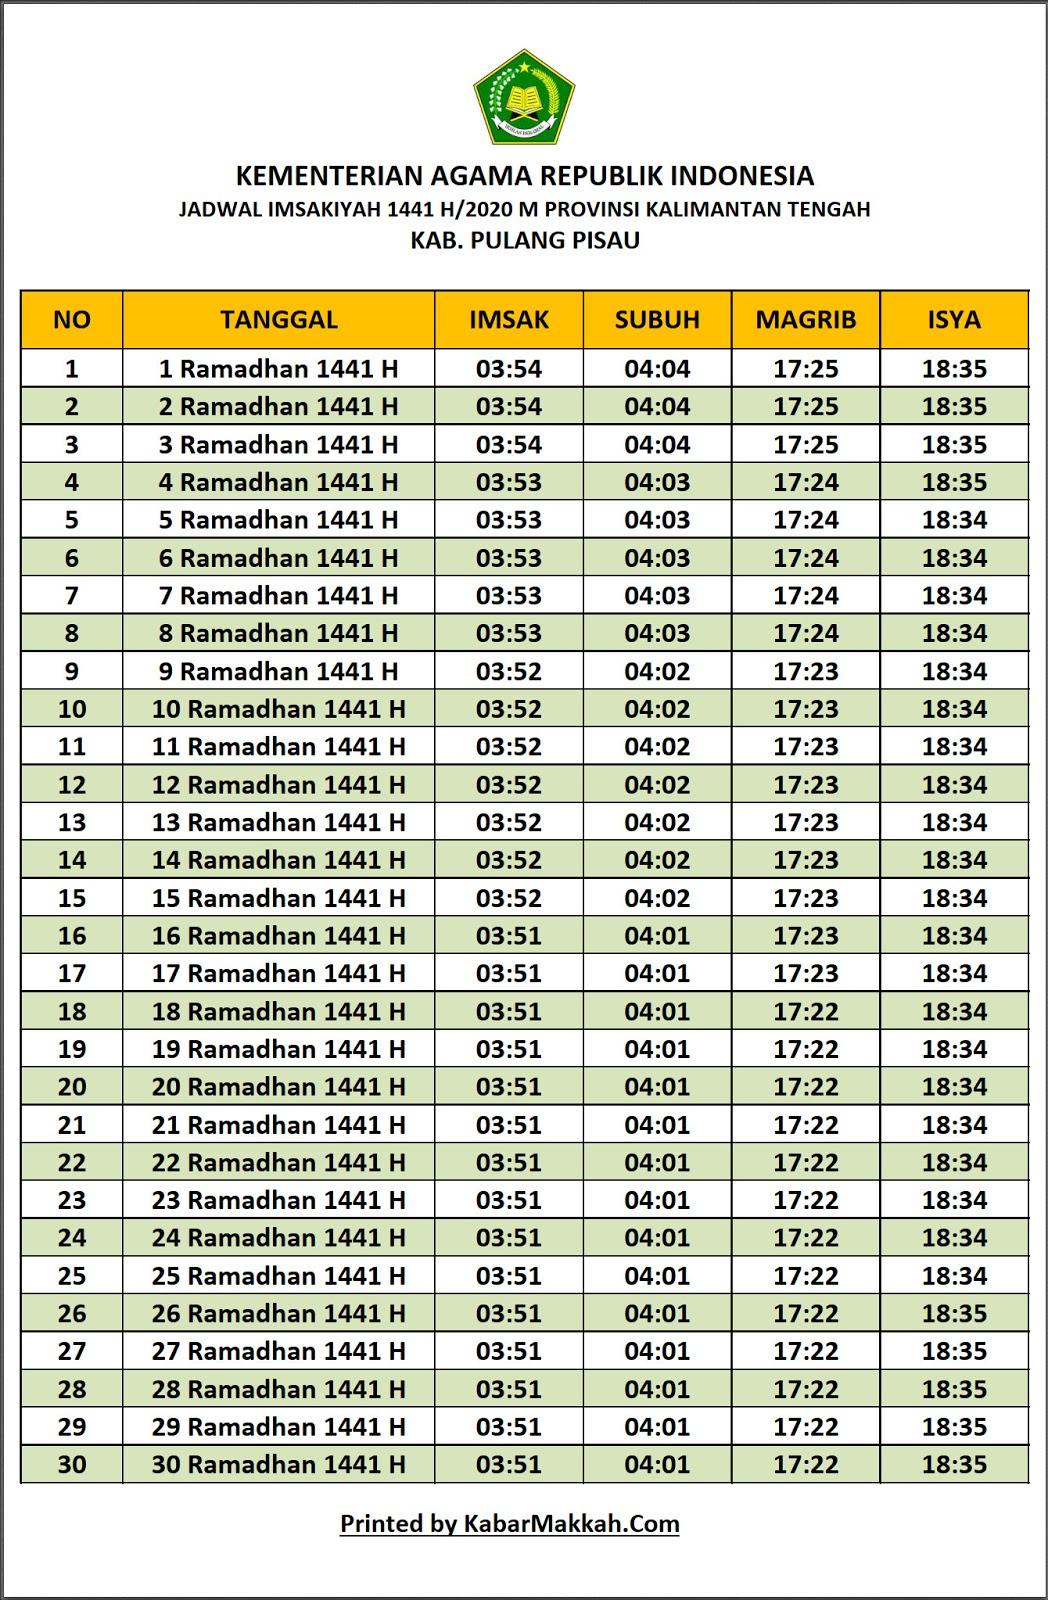 Jadwal Imsakiyah Pulau Pisau 2020